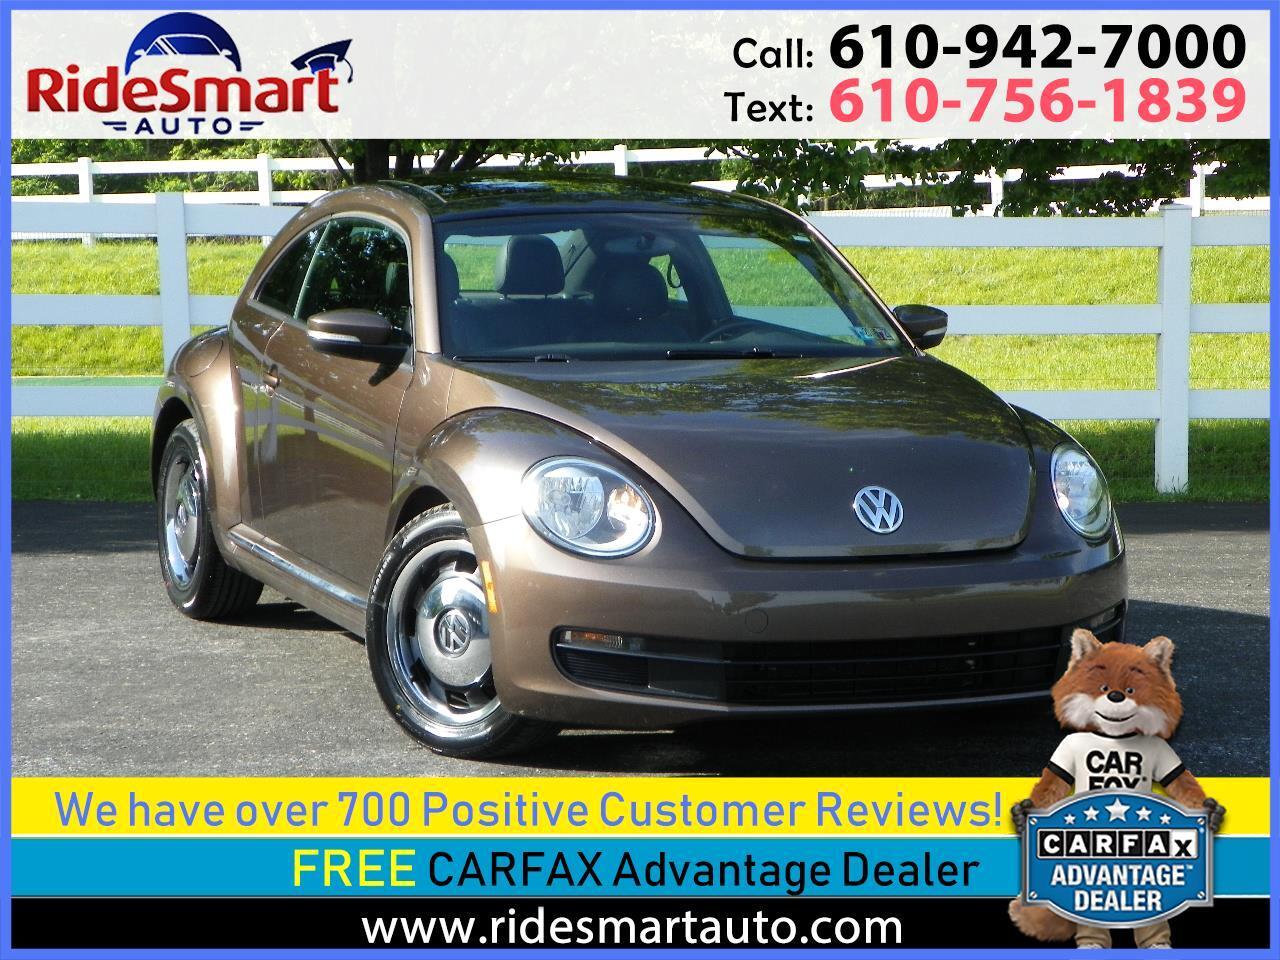 2012 Volkswagen Beetle 2.5L w/Sunroof